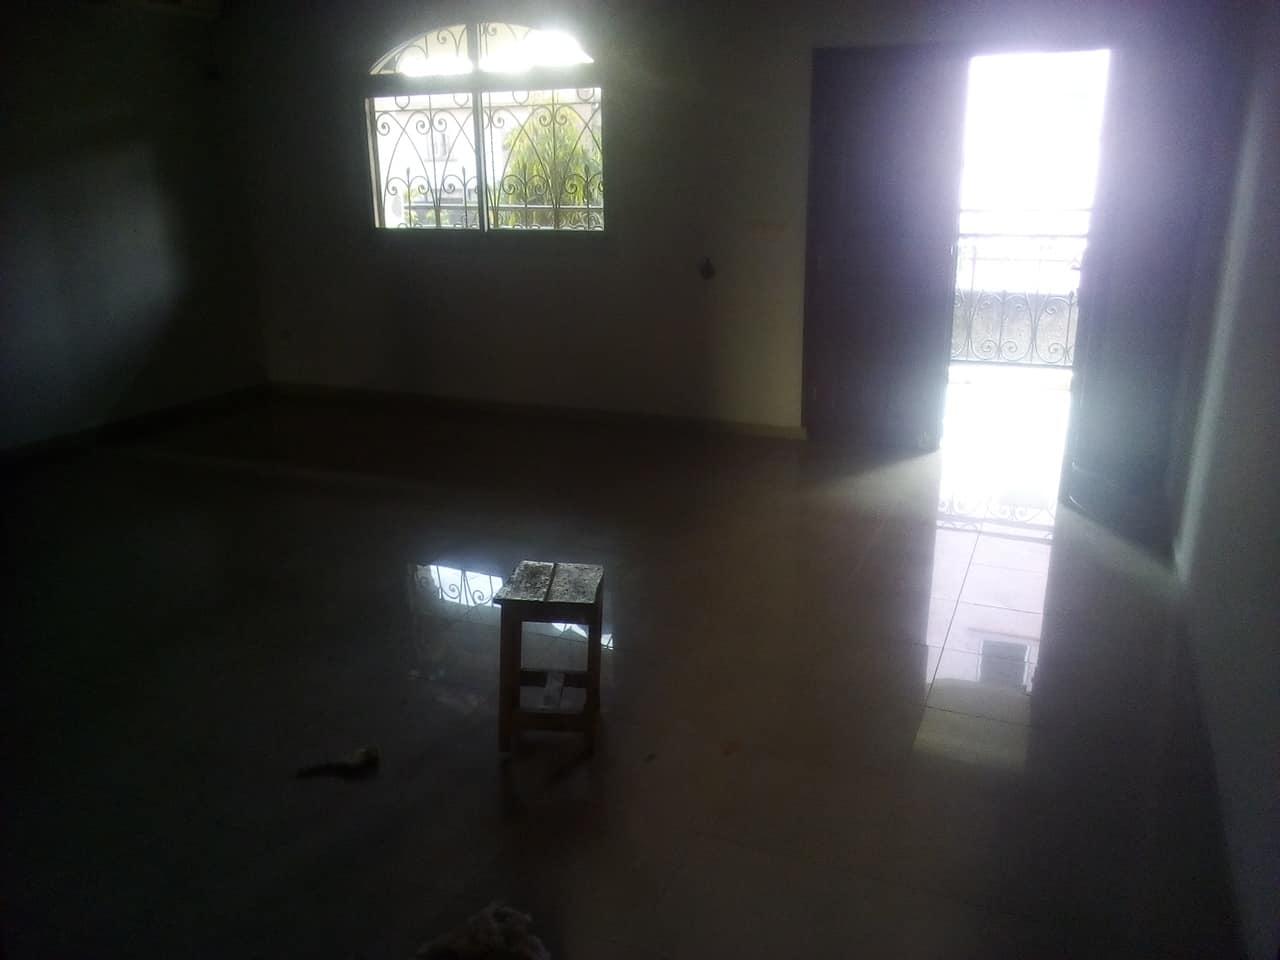 Apartment to rent - Yaoundé, Mfandena, avenue foe - 1 living room(s), 3 bedroom(s), 3 bathroom(s) - 350 000 FCFA / month